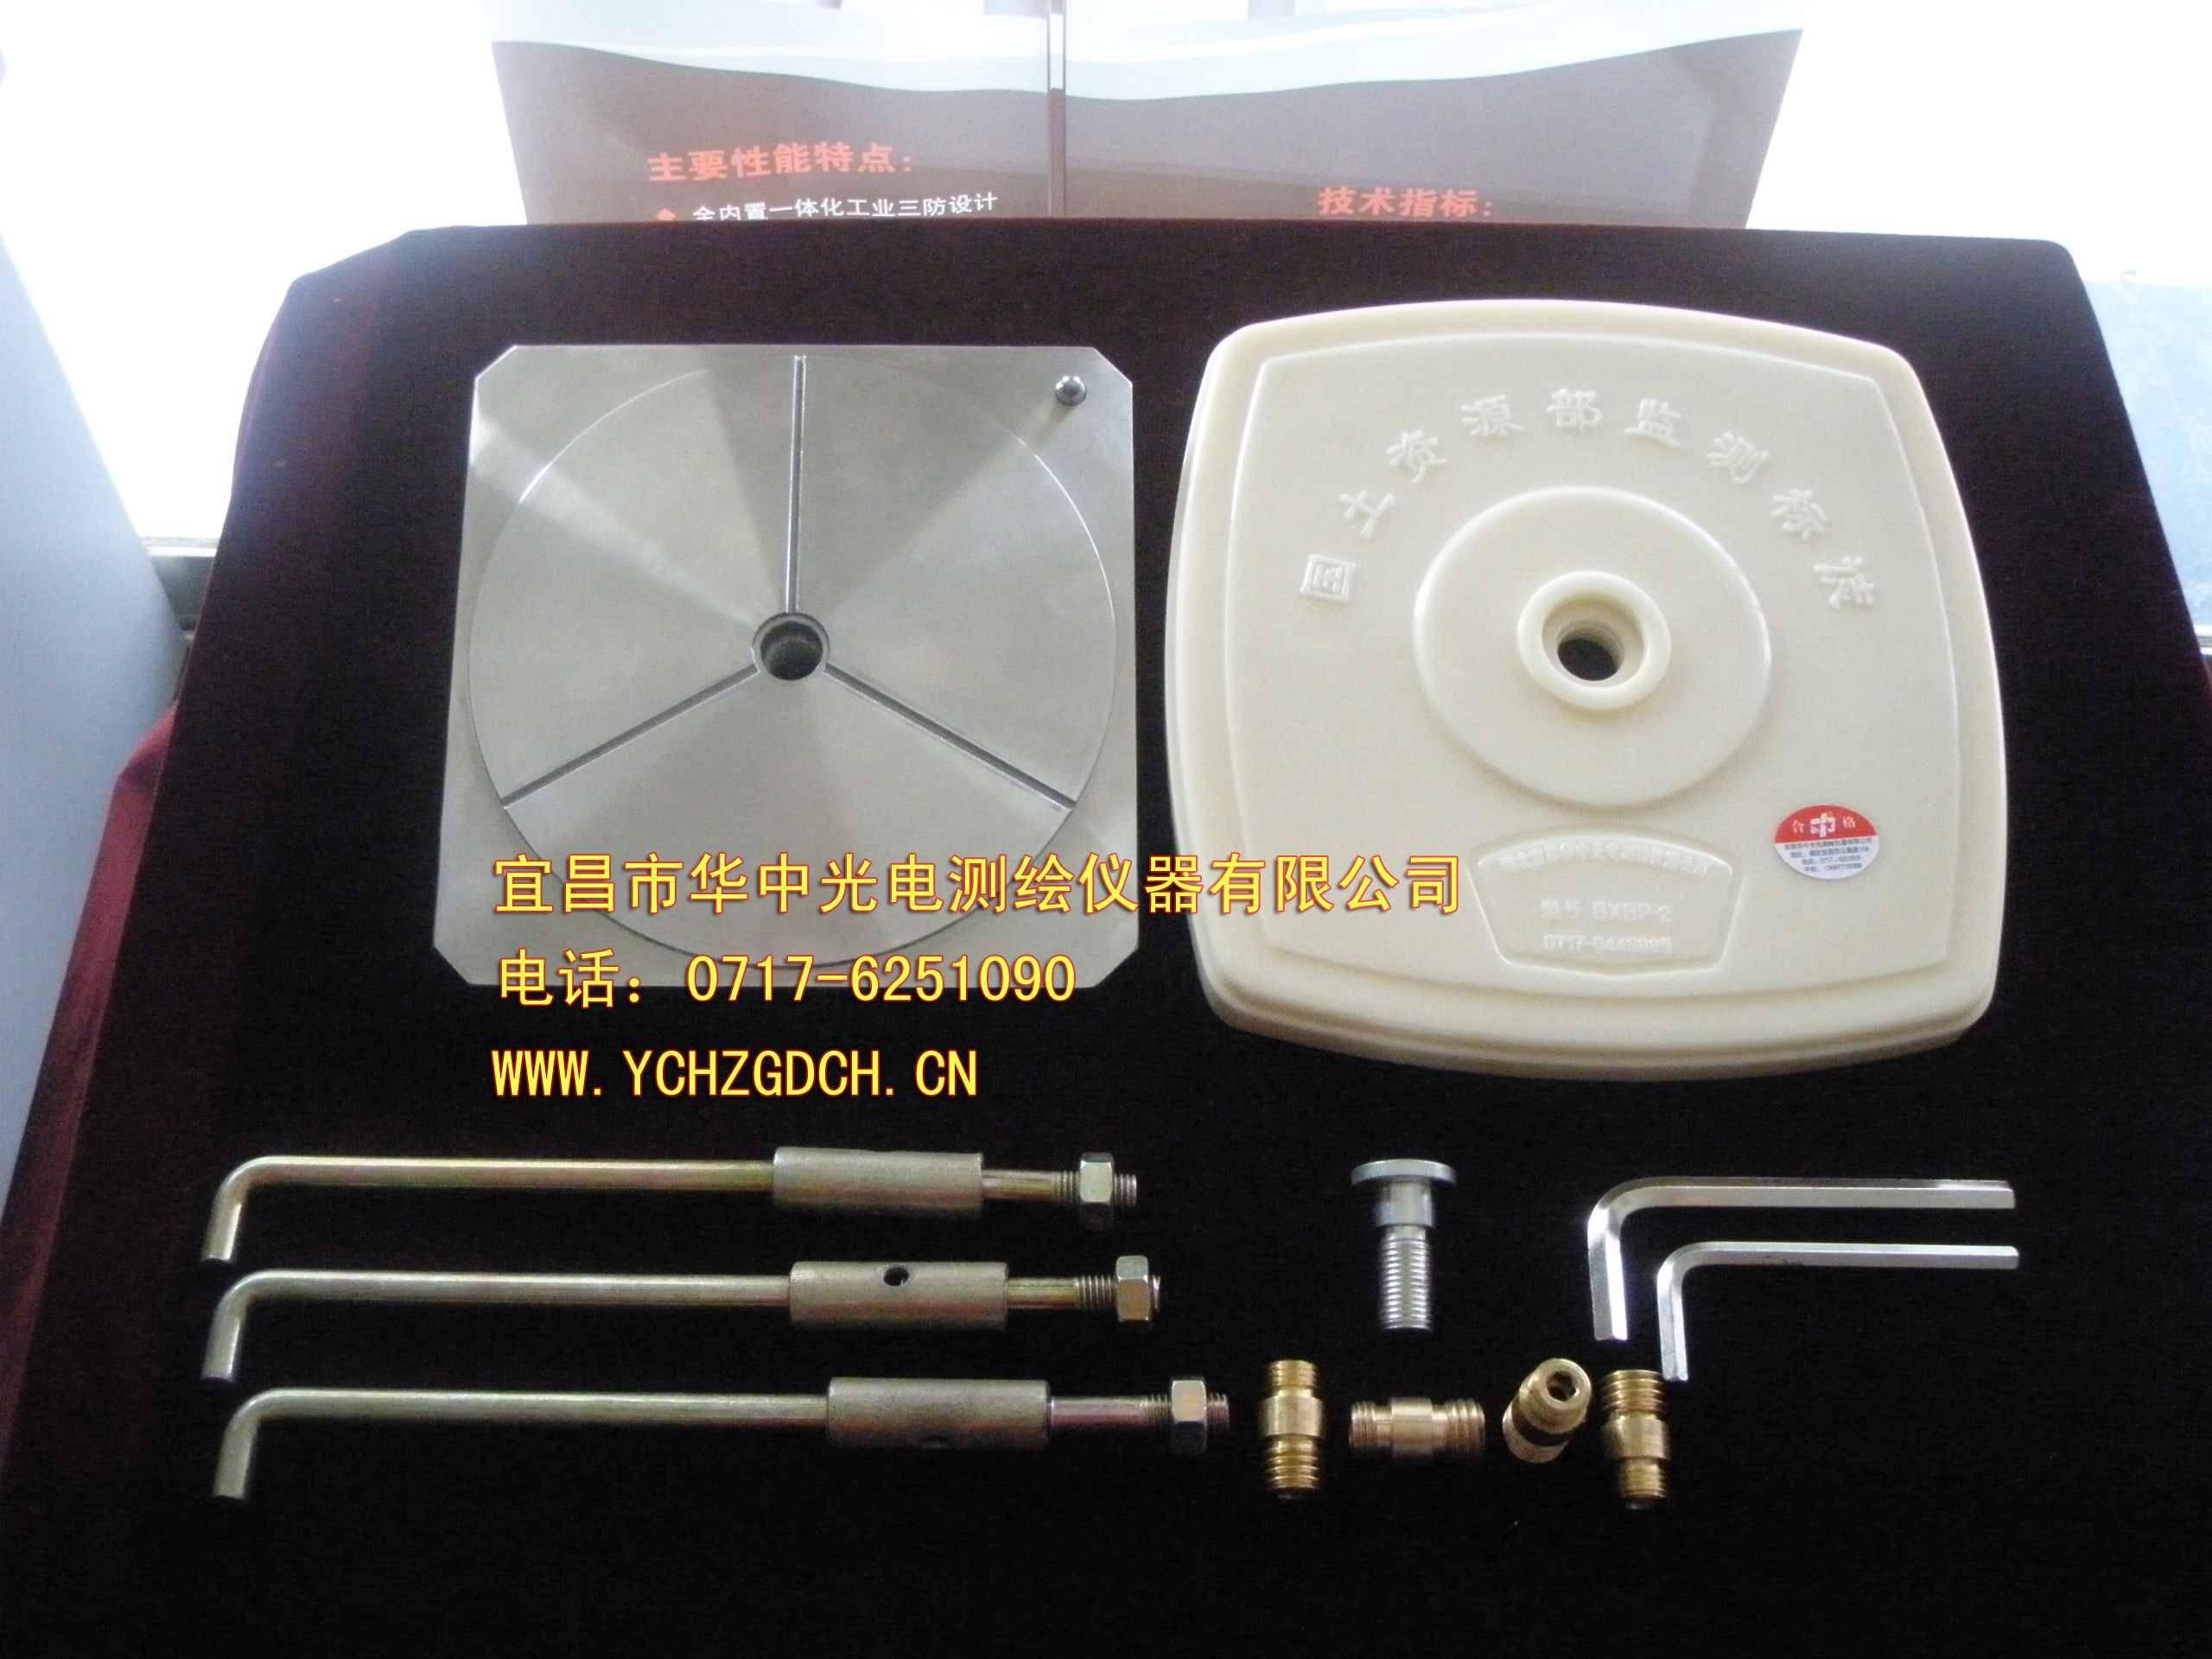 BXBP-1 Gauge plate